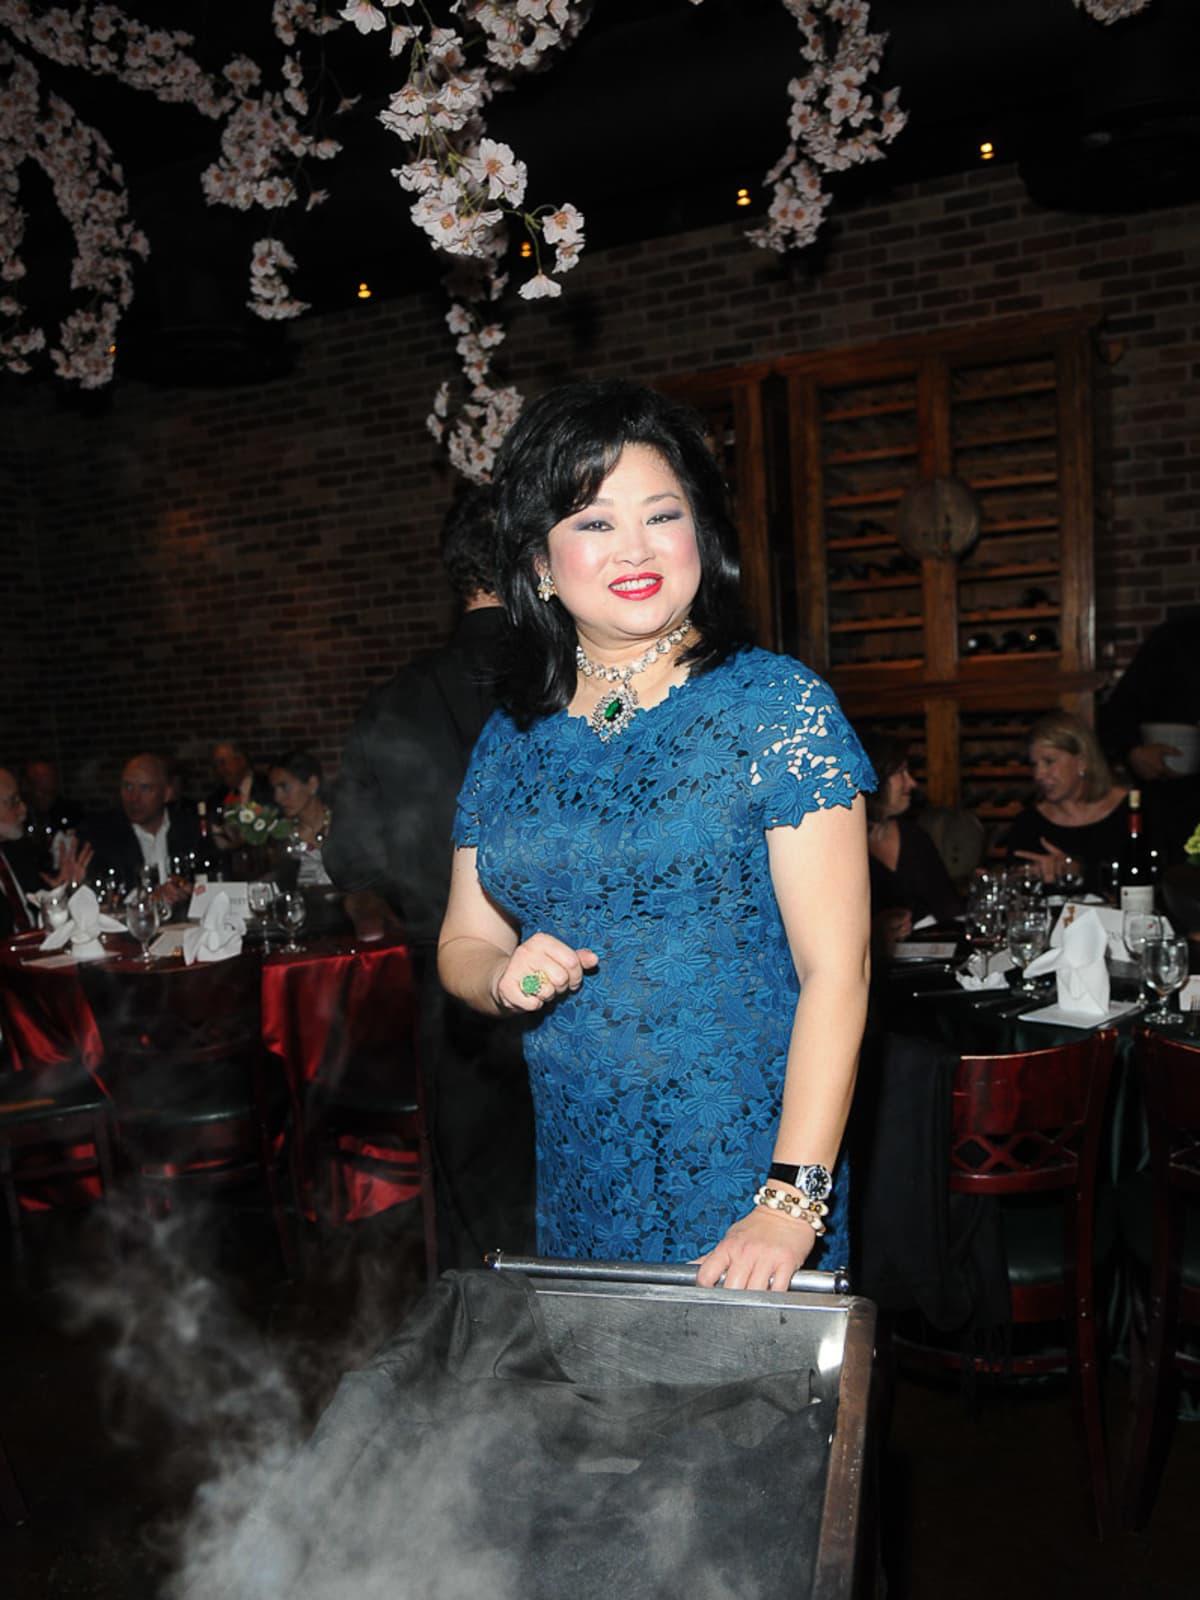 Joyful Toyful at Gigi's, December 2012, Gigi Huang, December 2012